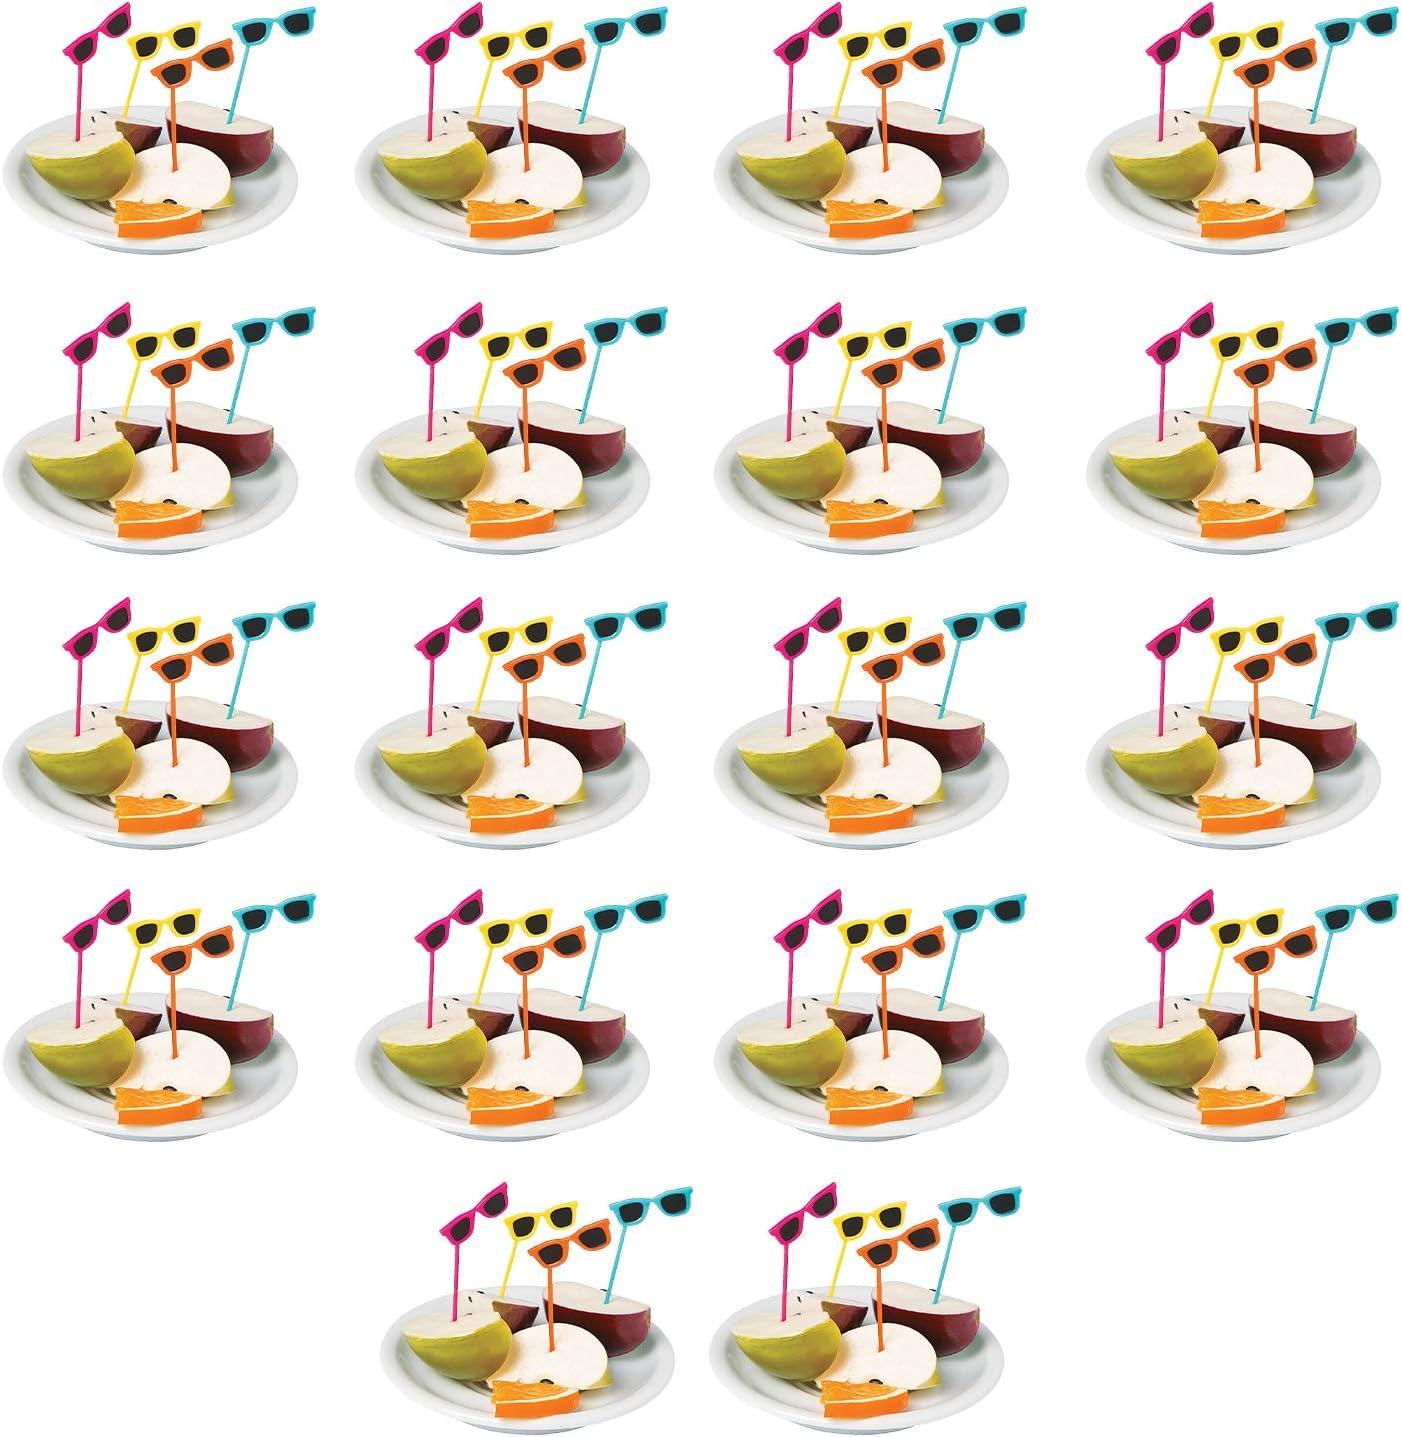 Fun Express - Sunglasses Plastic Picks (72pc) - Party Supplies - Serveware & Barware - Picks & Stirrers & Parasols - 72 Pieces